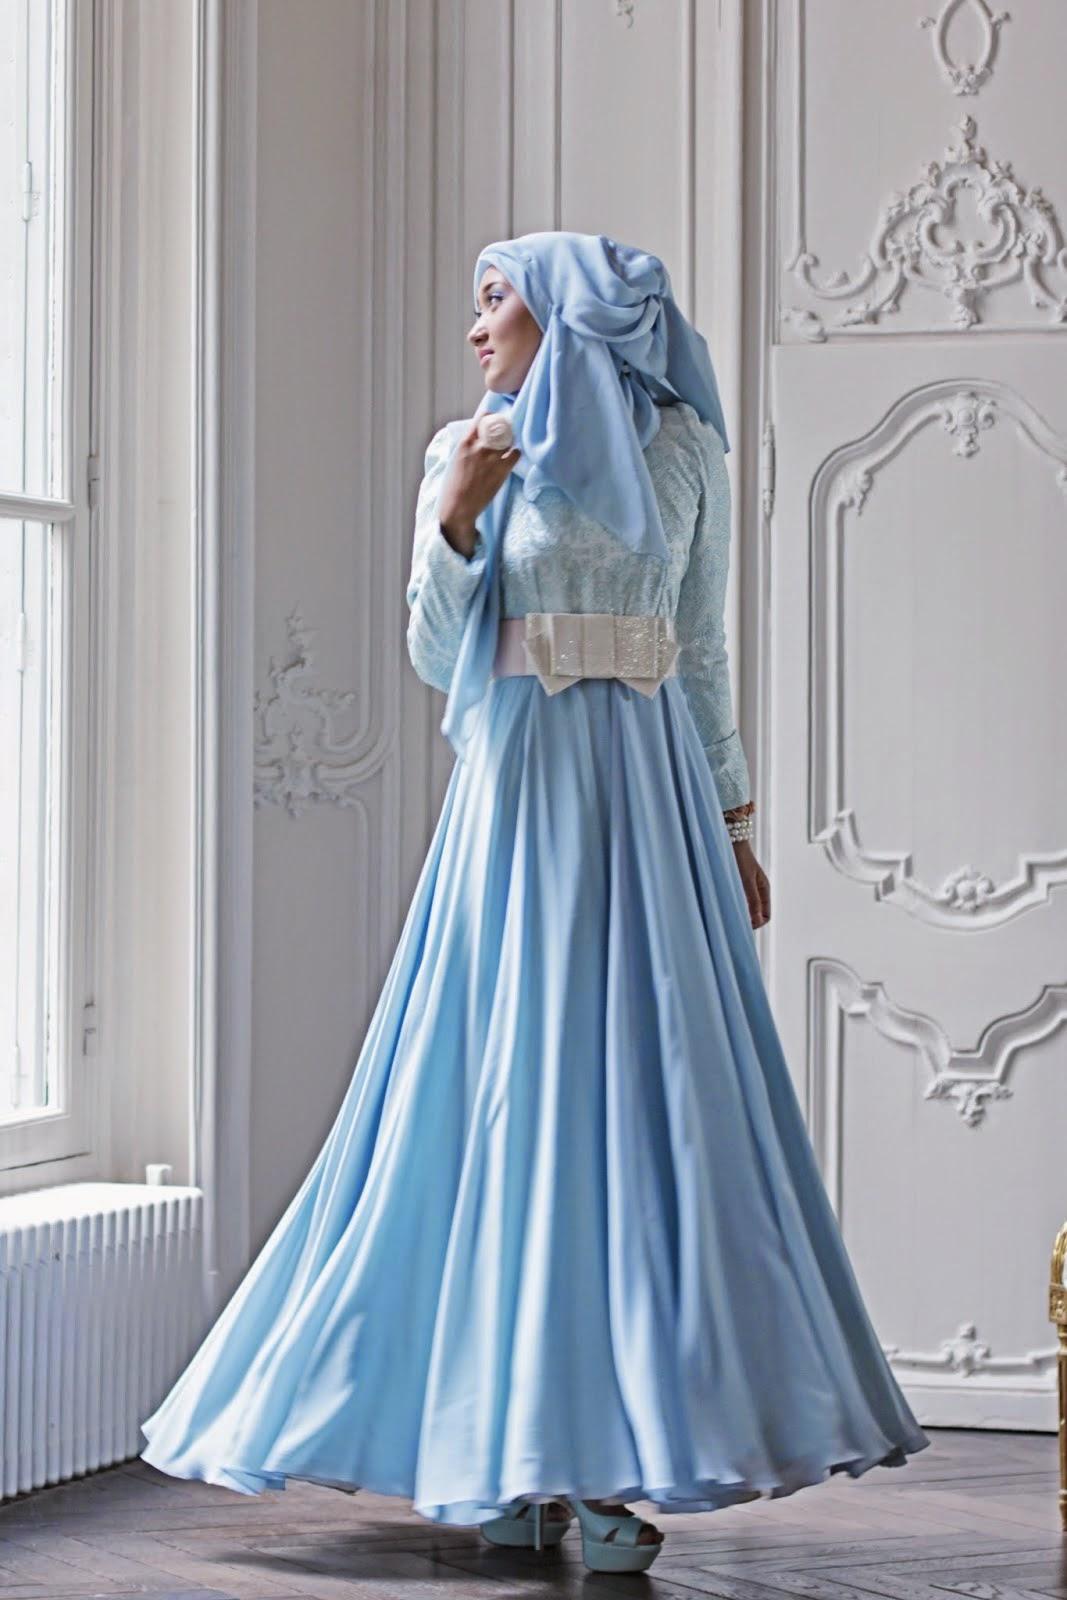 ModelBaju24 Model Baju Batik Gamis Terbaru 2017